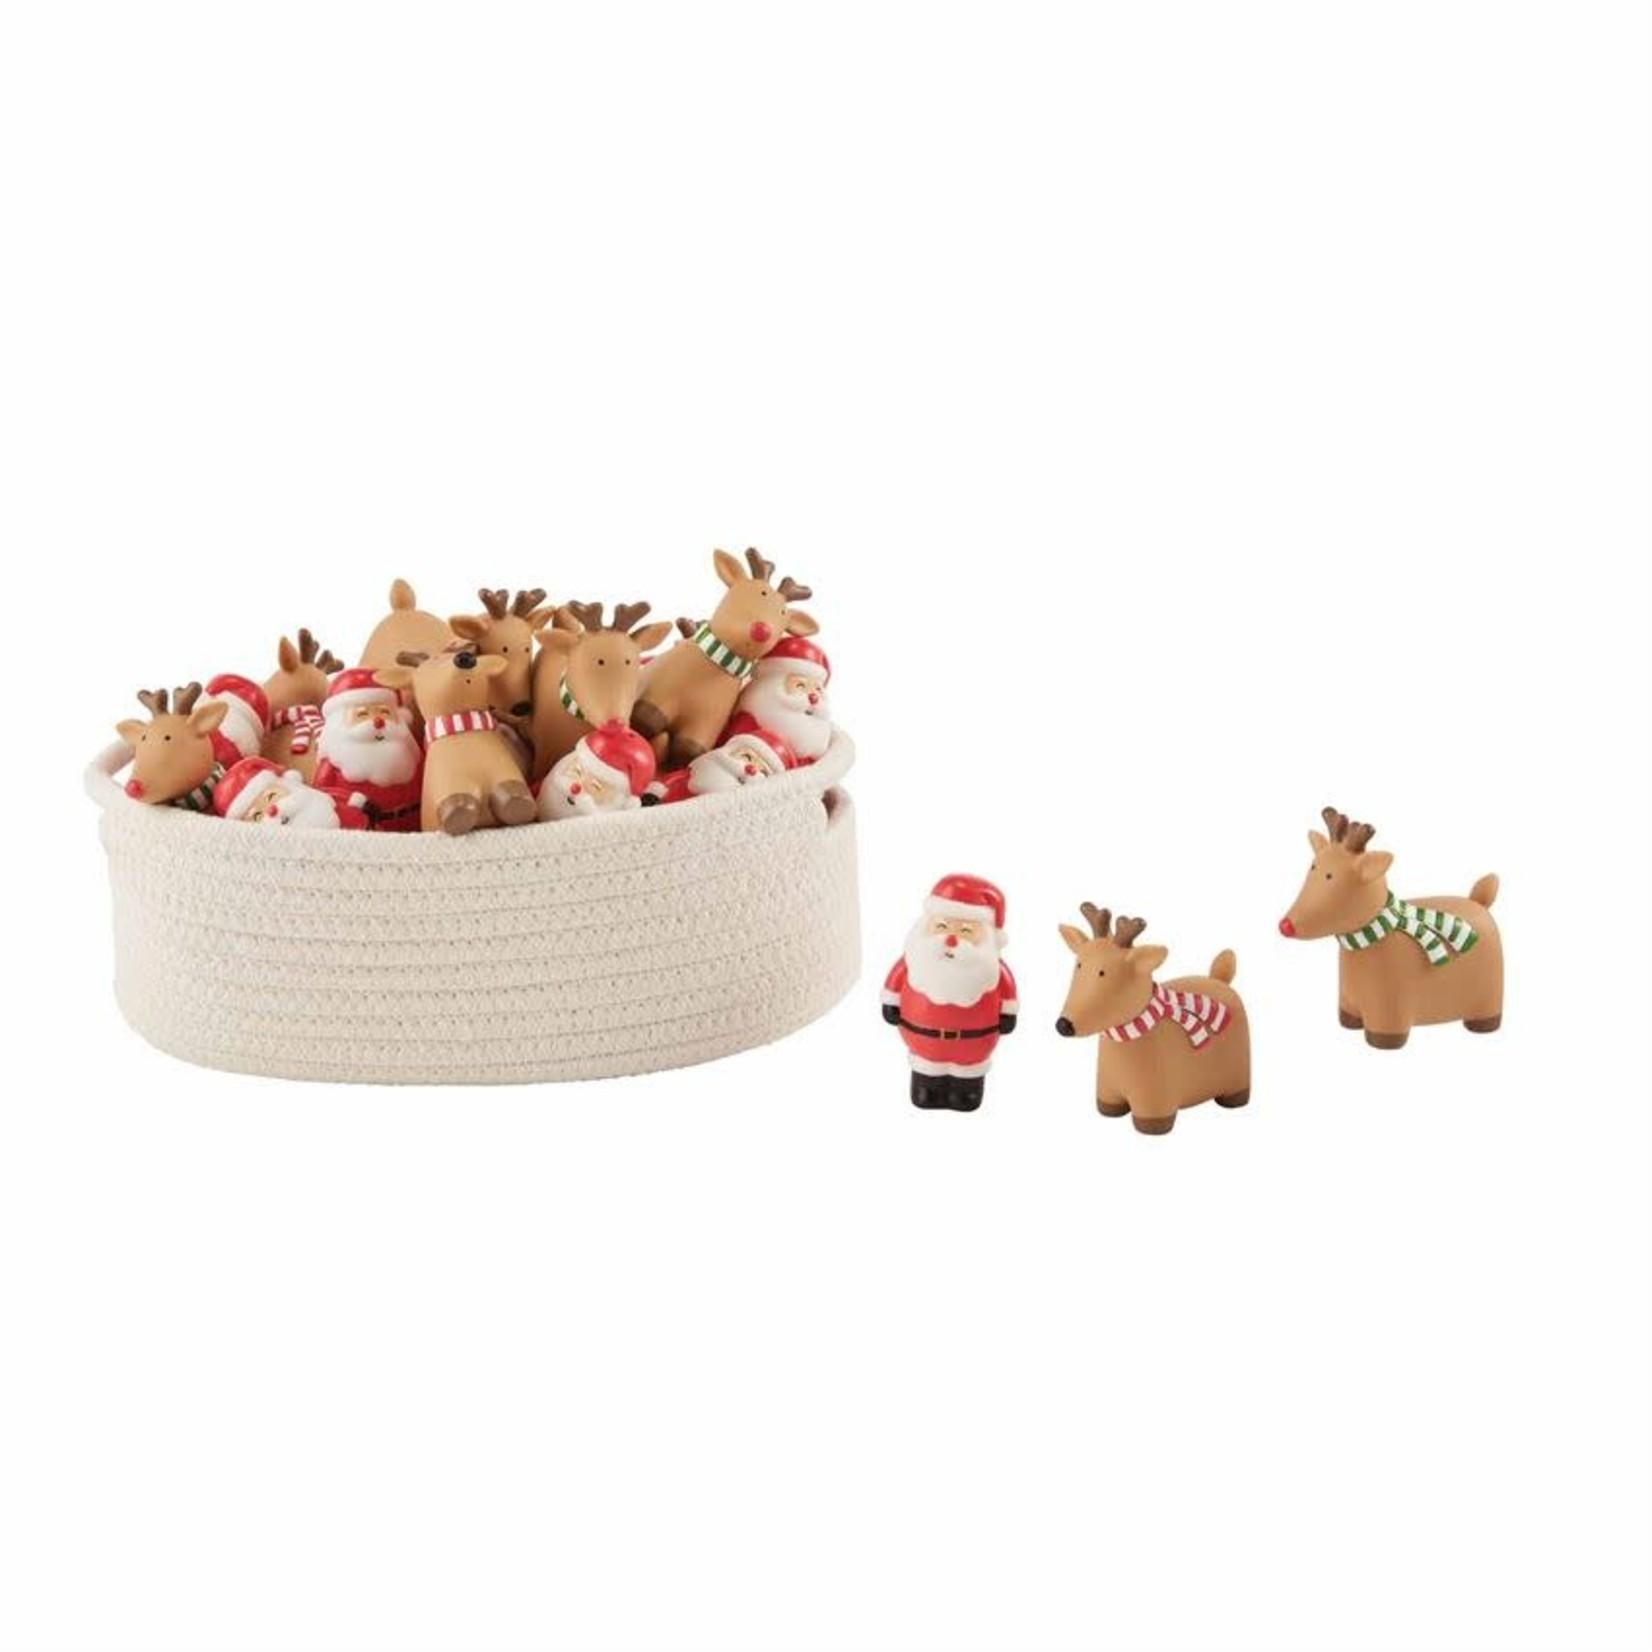 Mud Pie Bath Toy - Reindeer